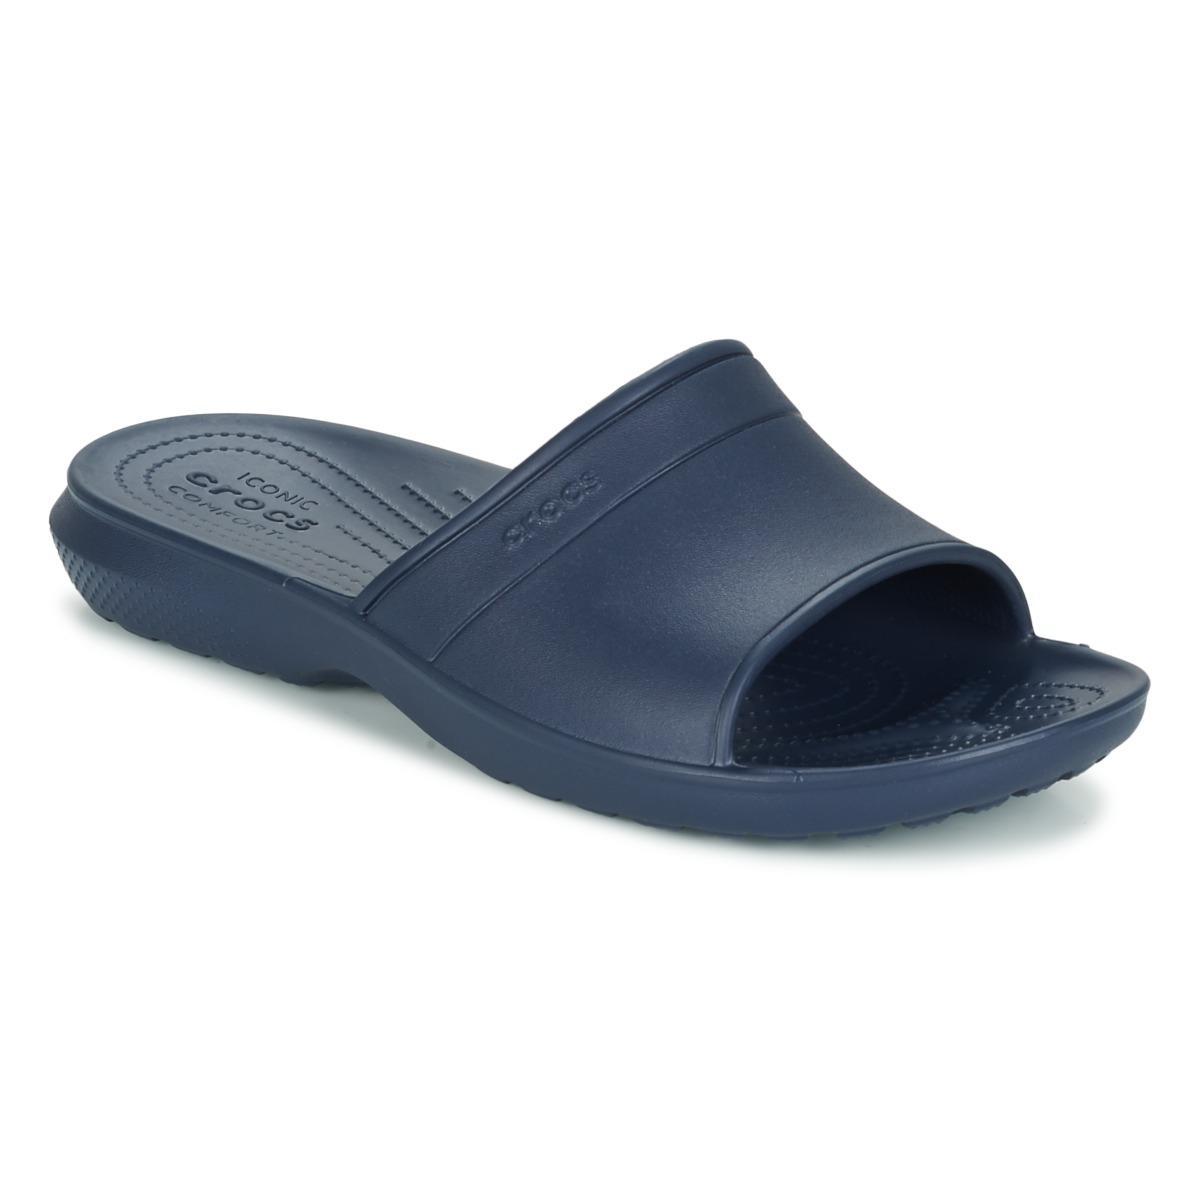 cebabbeed64 Crocs pantofle Classic Slide Crocs - Glami.cz